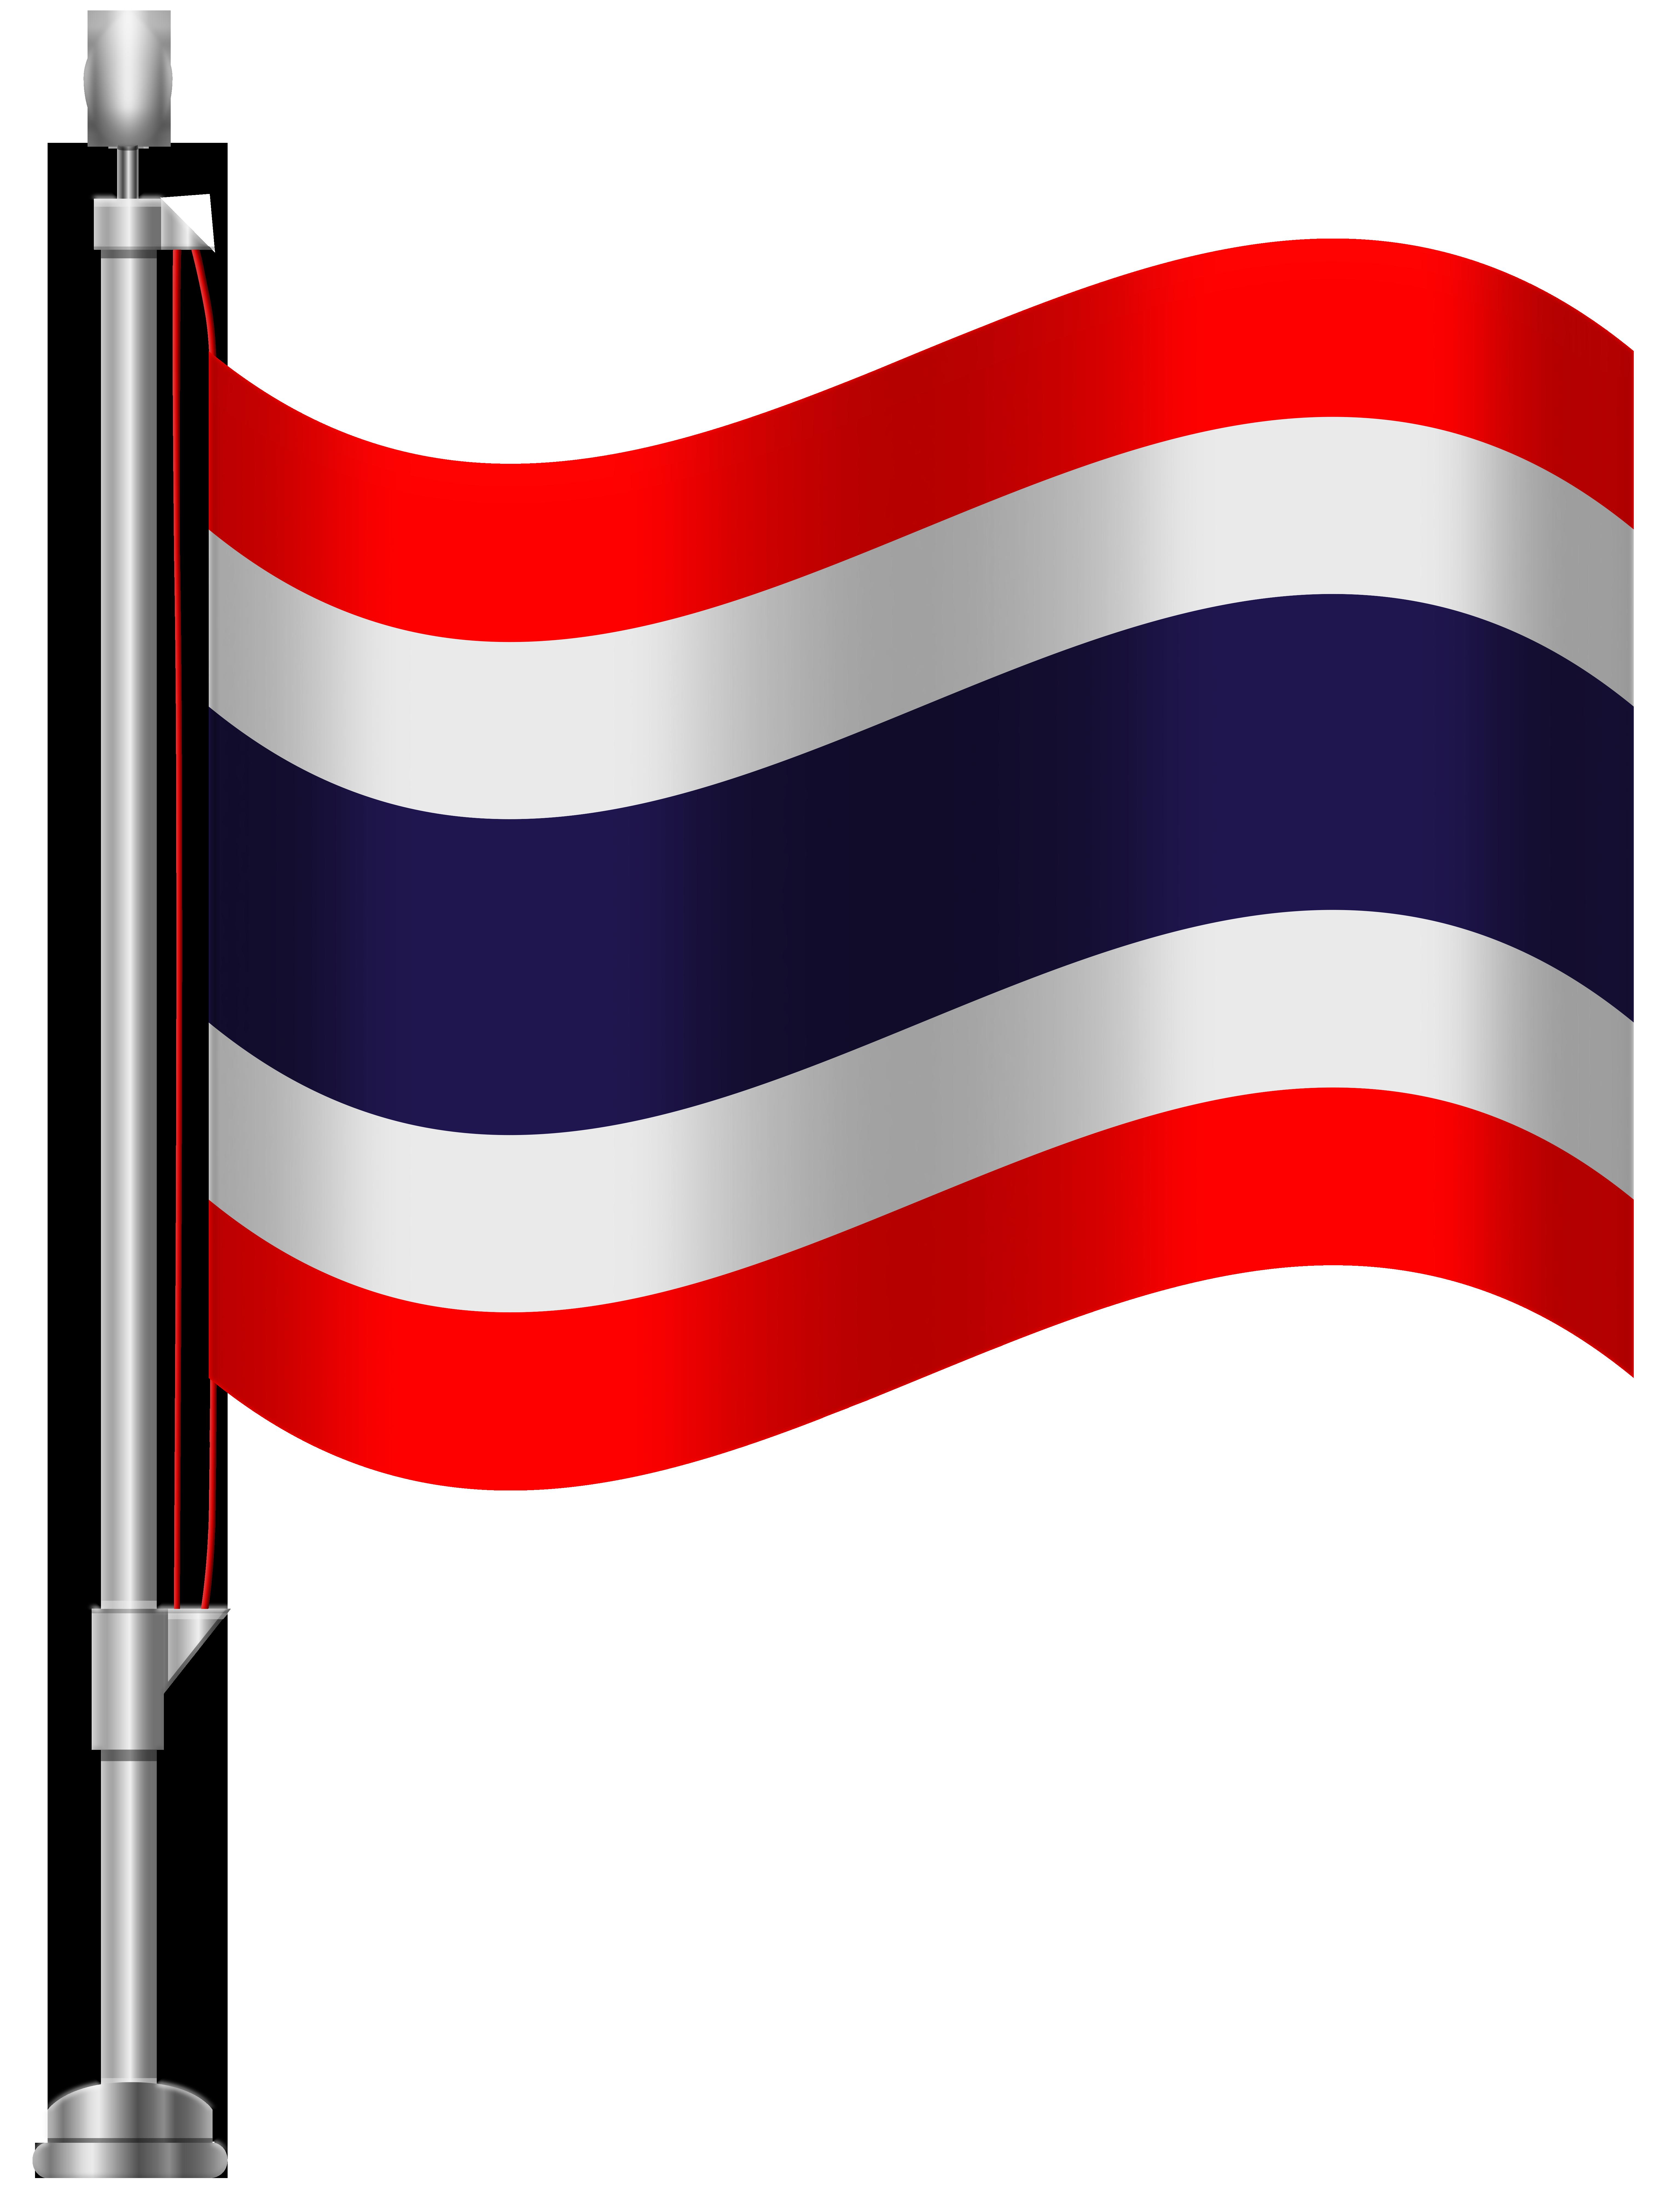 Flags clipart patriotic. Medicine wheel at getdrawings